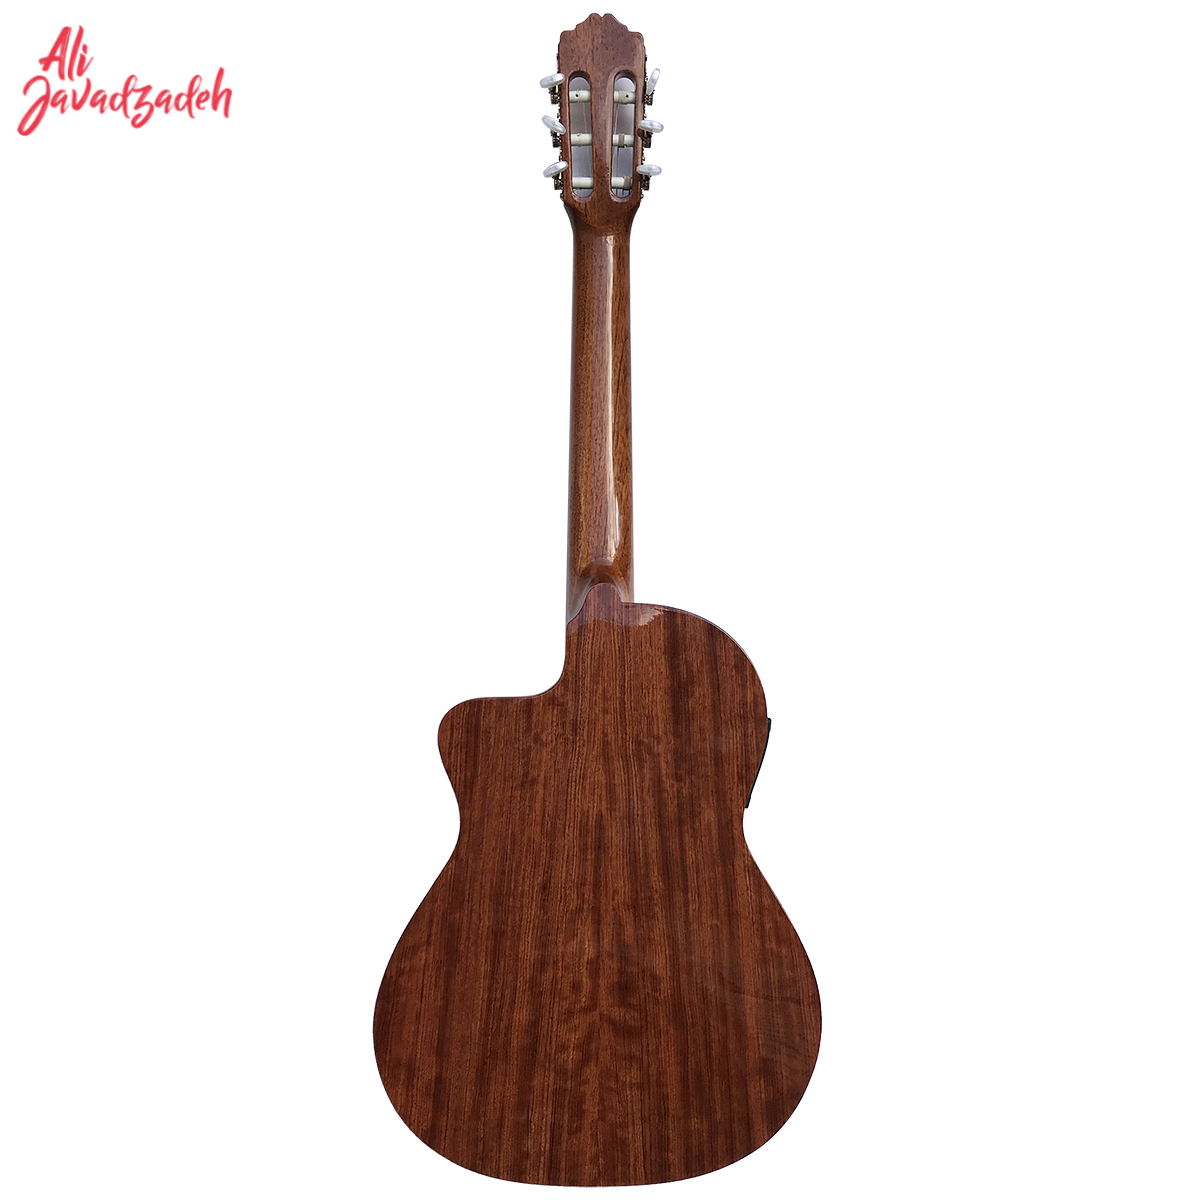 گیتار کلاسیک آنتونیو سانچز مدل S-20 CE-NB